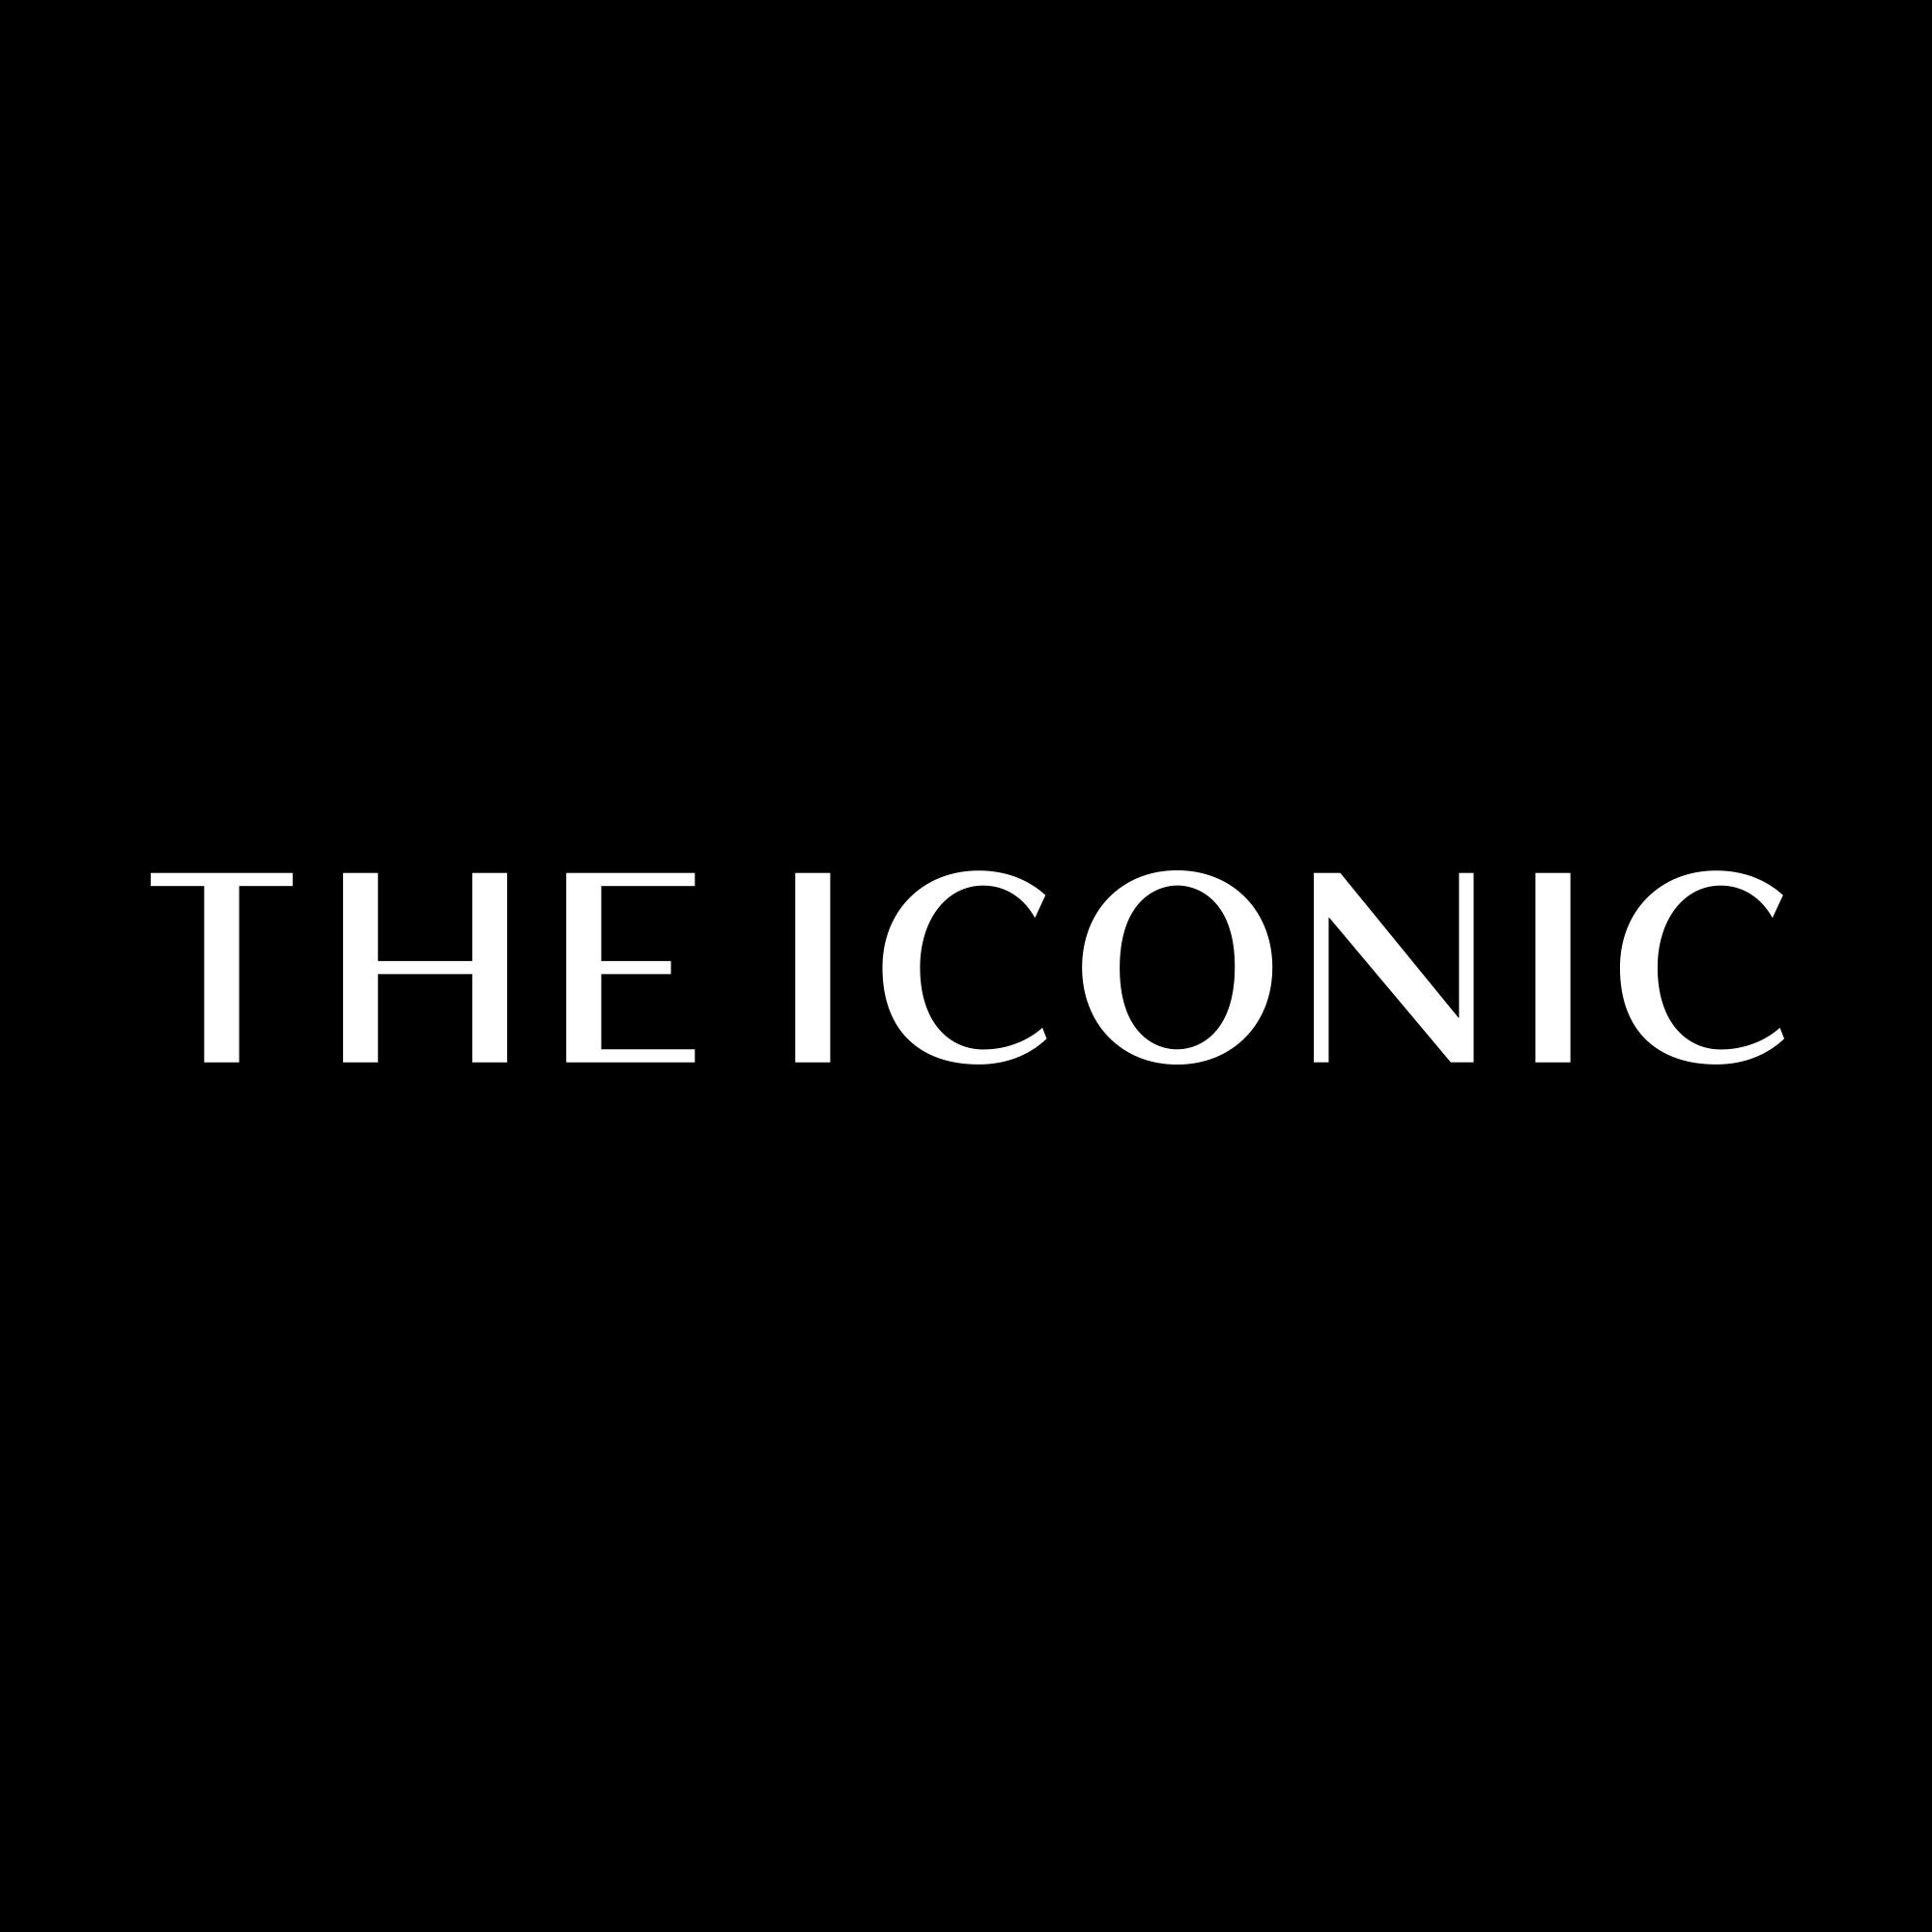 2000x2000_THEICONIC_logo